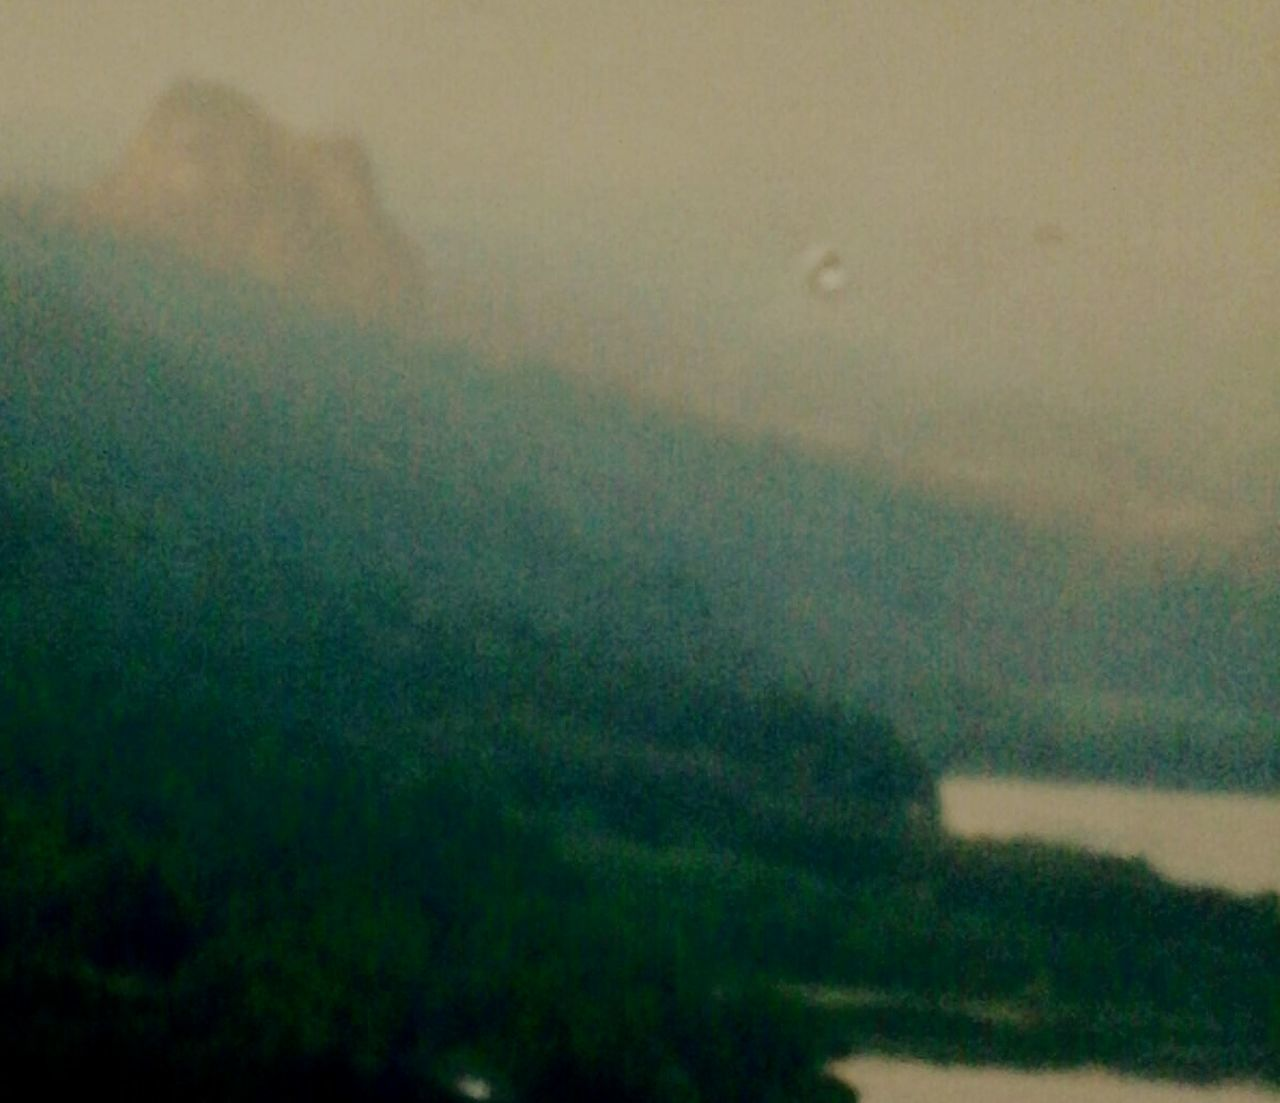 Beacon Rock,Washington Being Adventurous Scaffolding And Rain on the side of the rain to climb ,fun 🍭🍯🍏🍑🍆🍊🍇🍓🍒